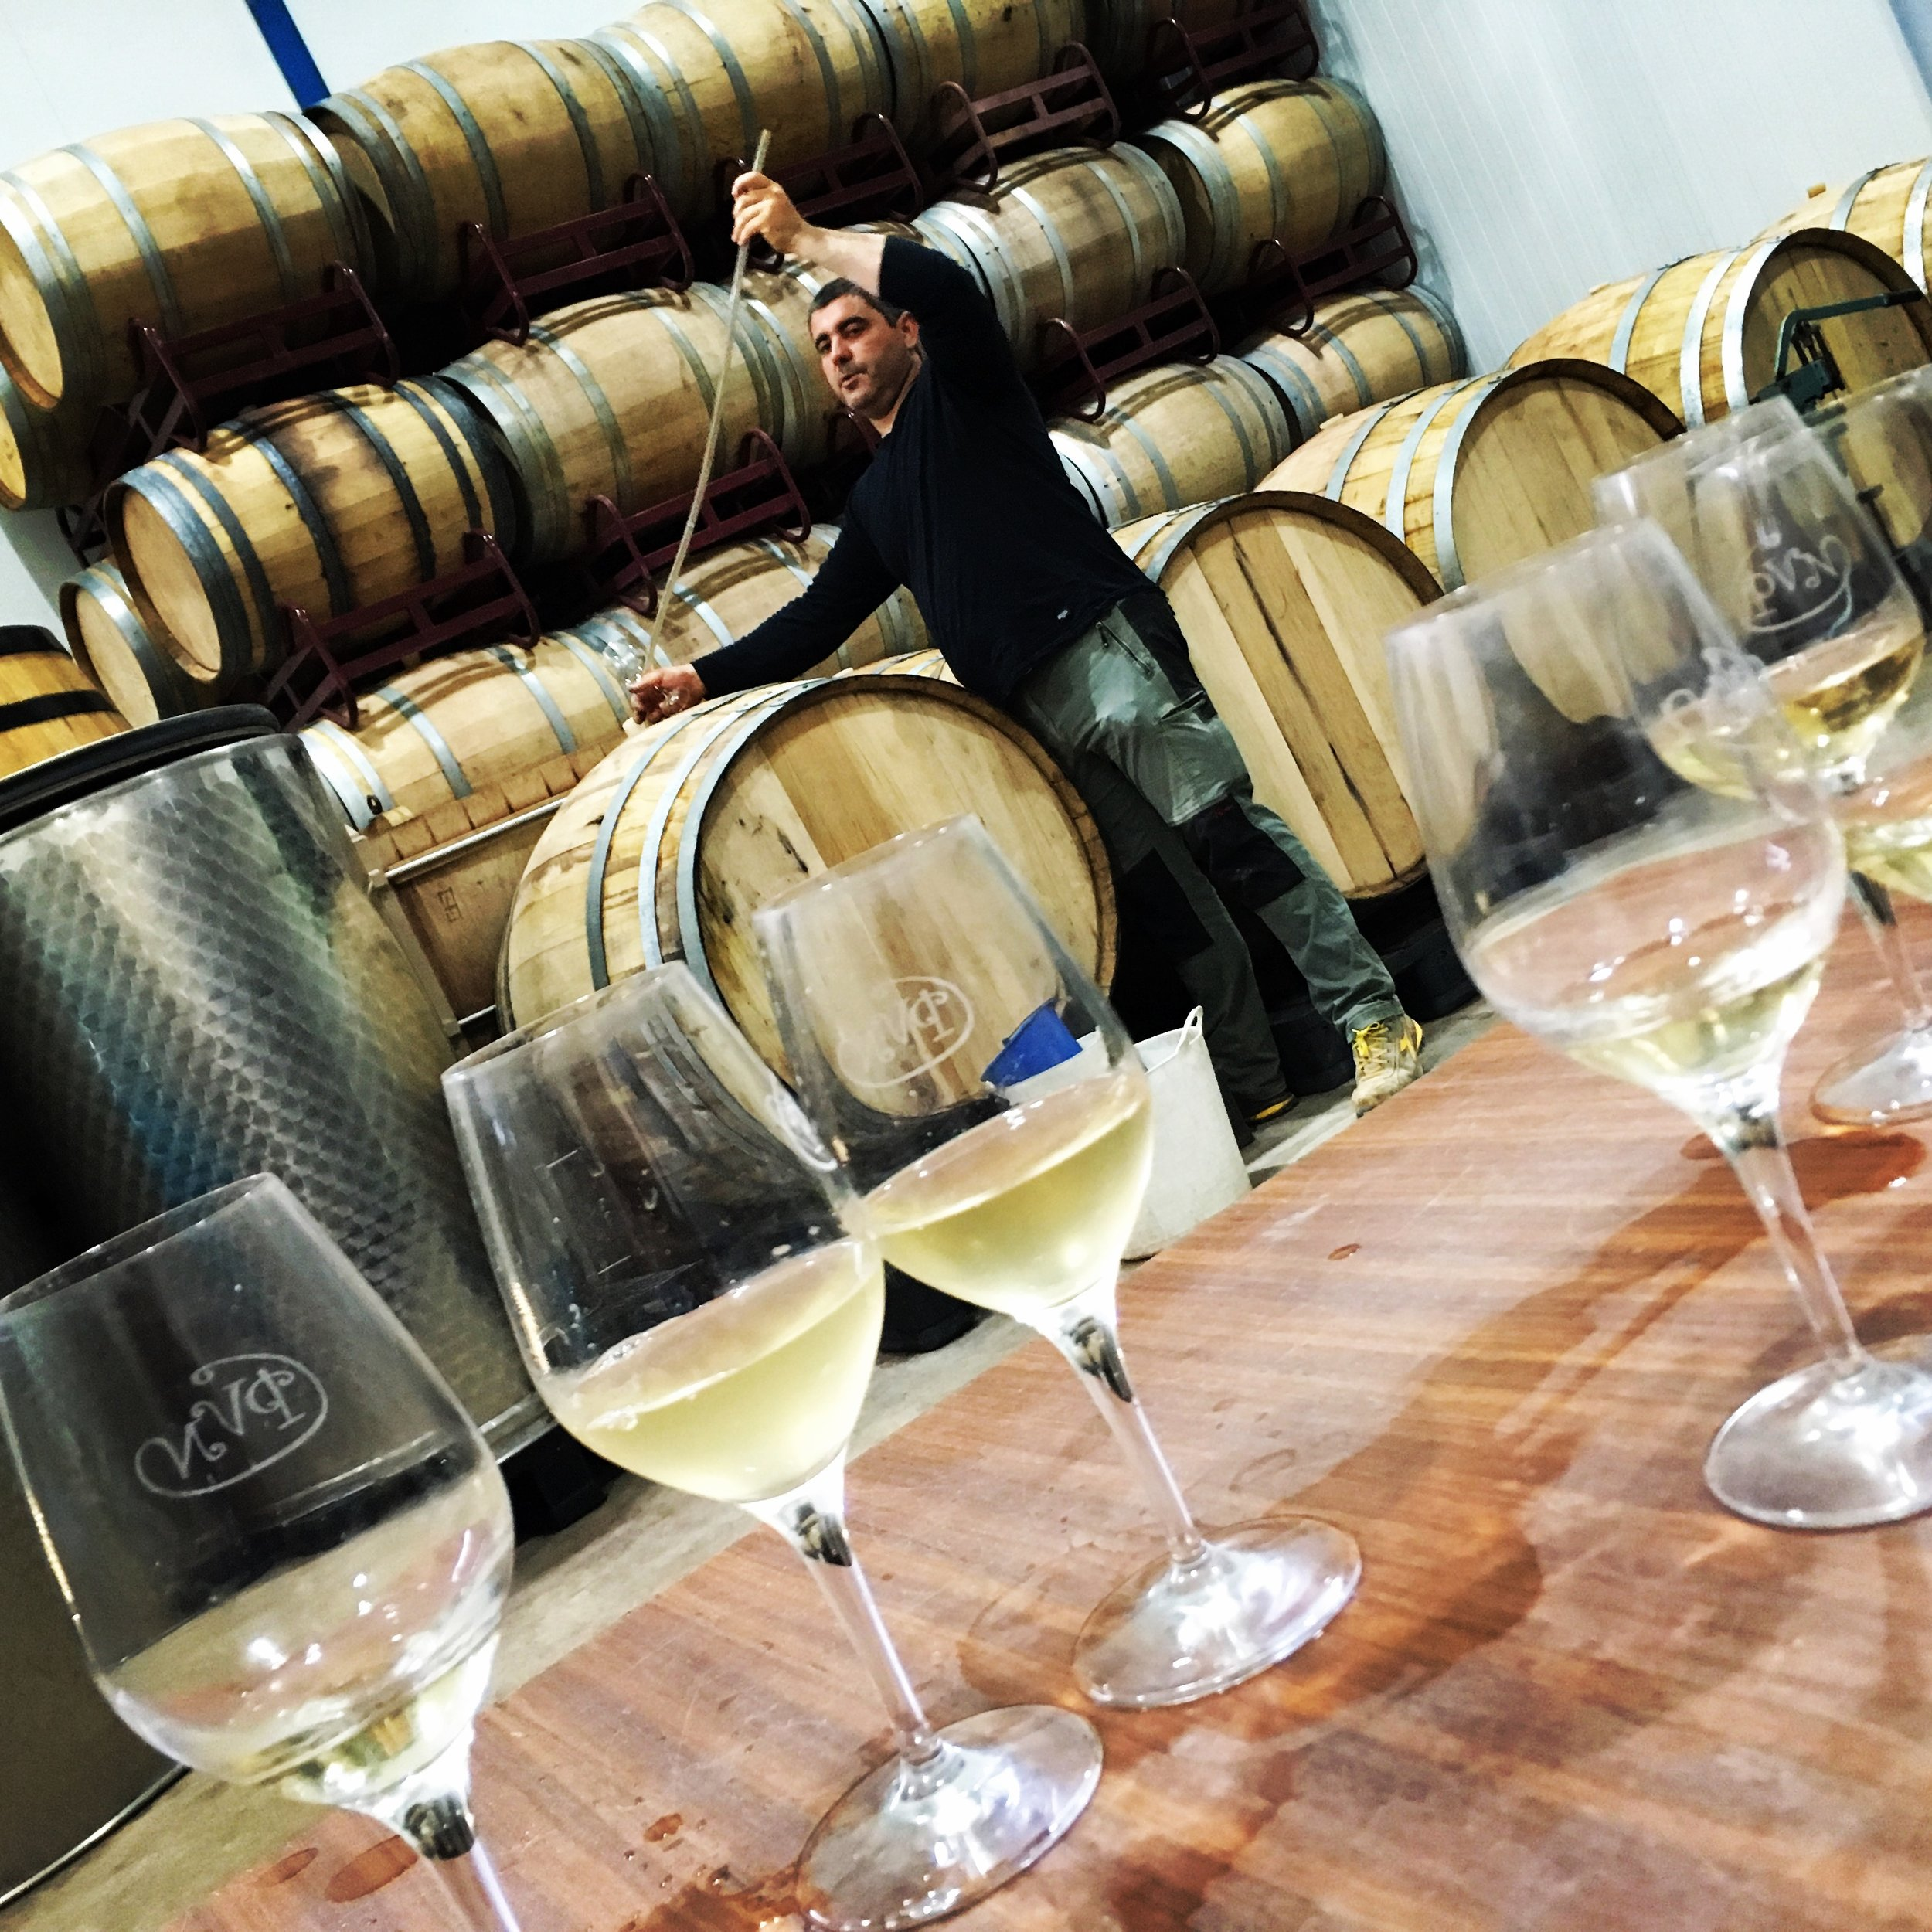 Tasting 'winds' from Tarancona vineyard